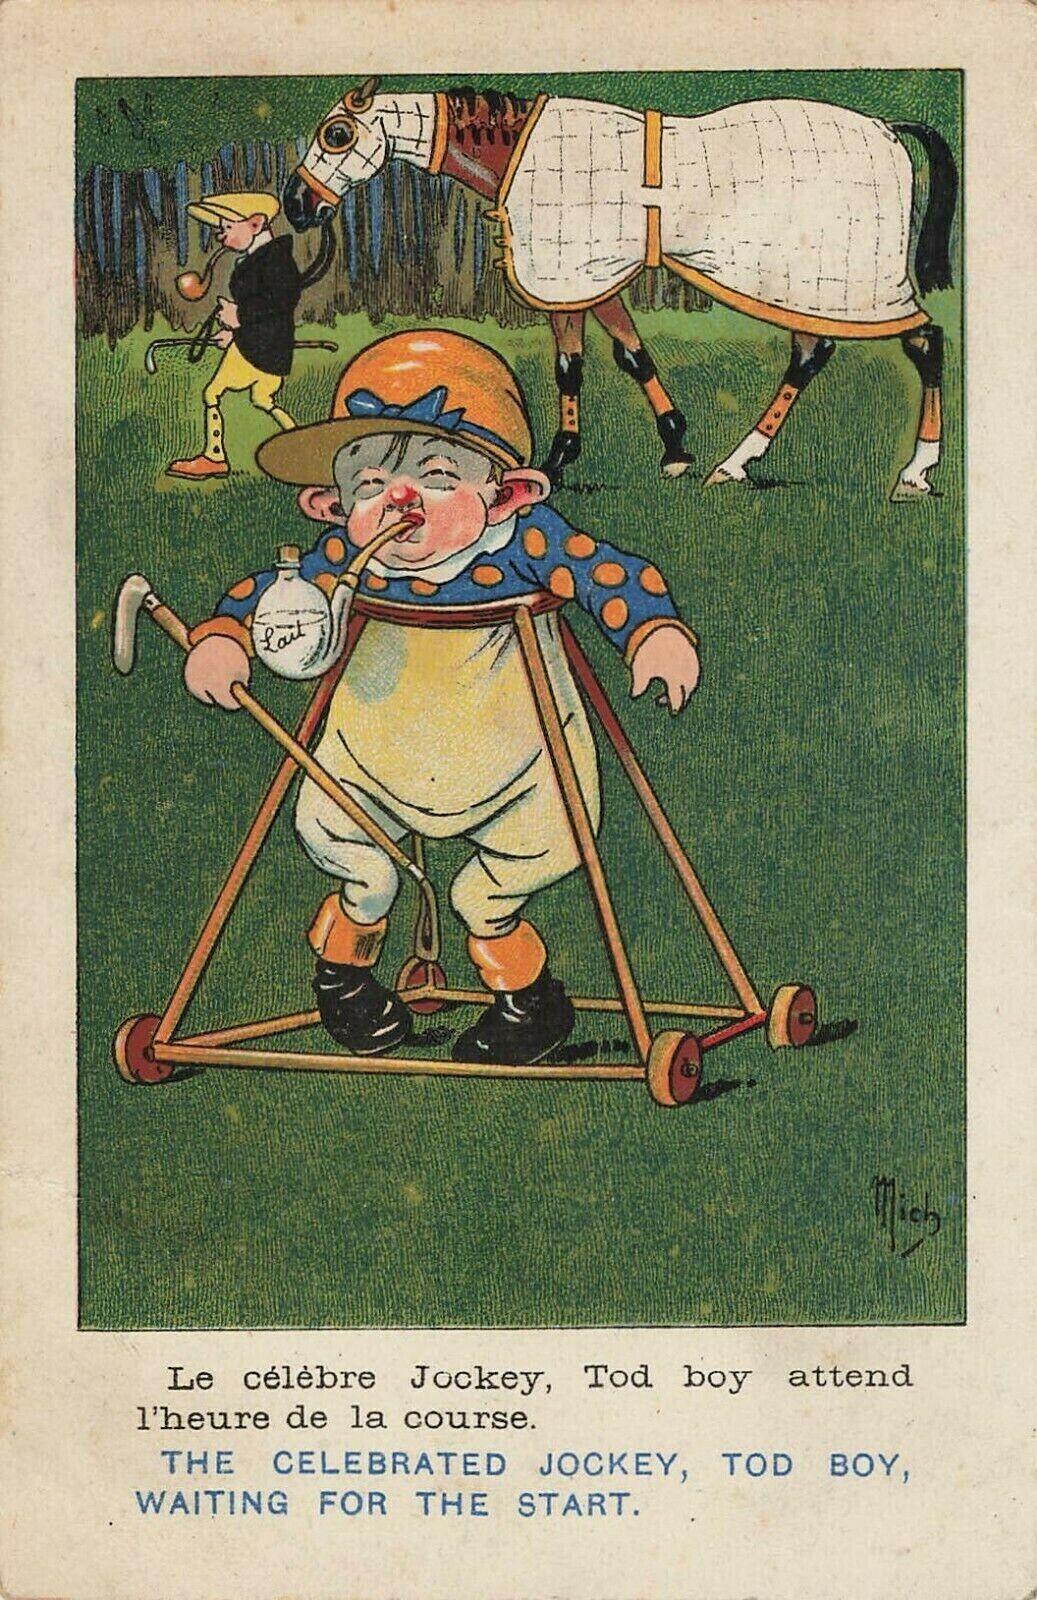 Comic Celebrated Jockey Tod Boy Waiting For The Start Antique Postcard